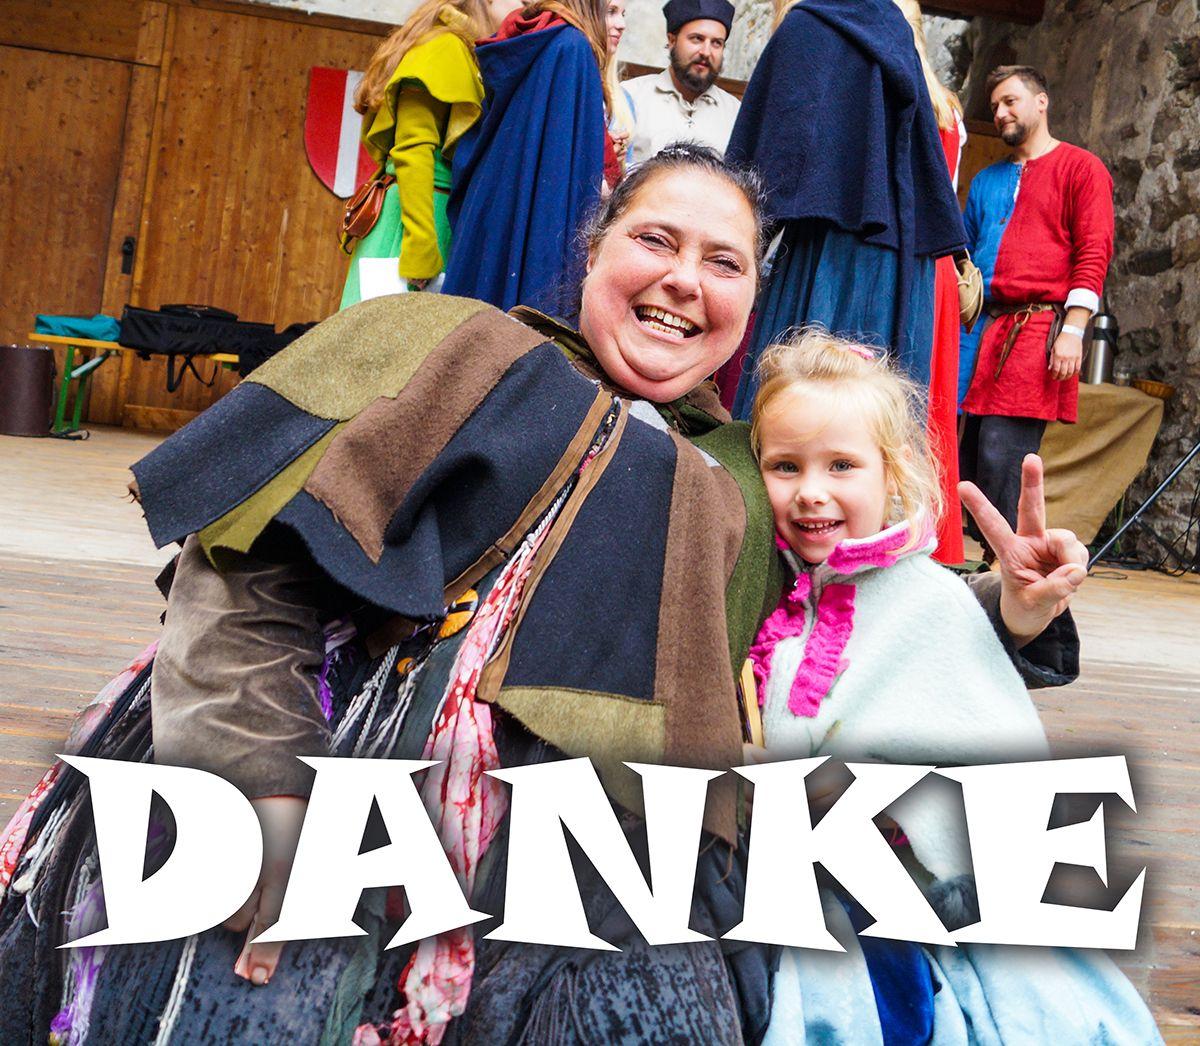 Burgfest 2018 - DANKE